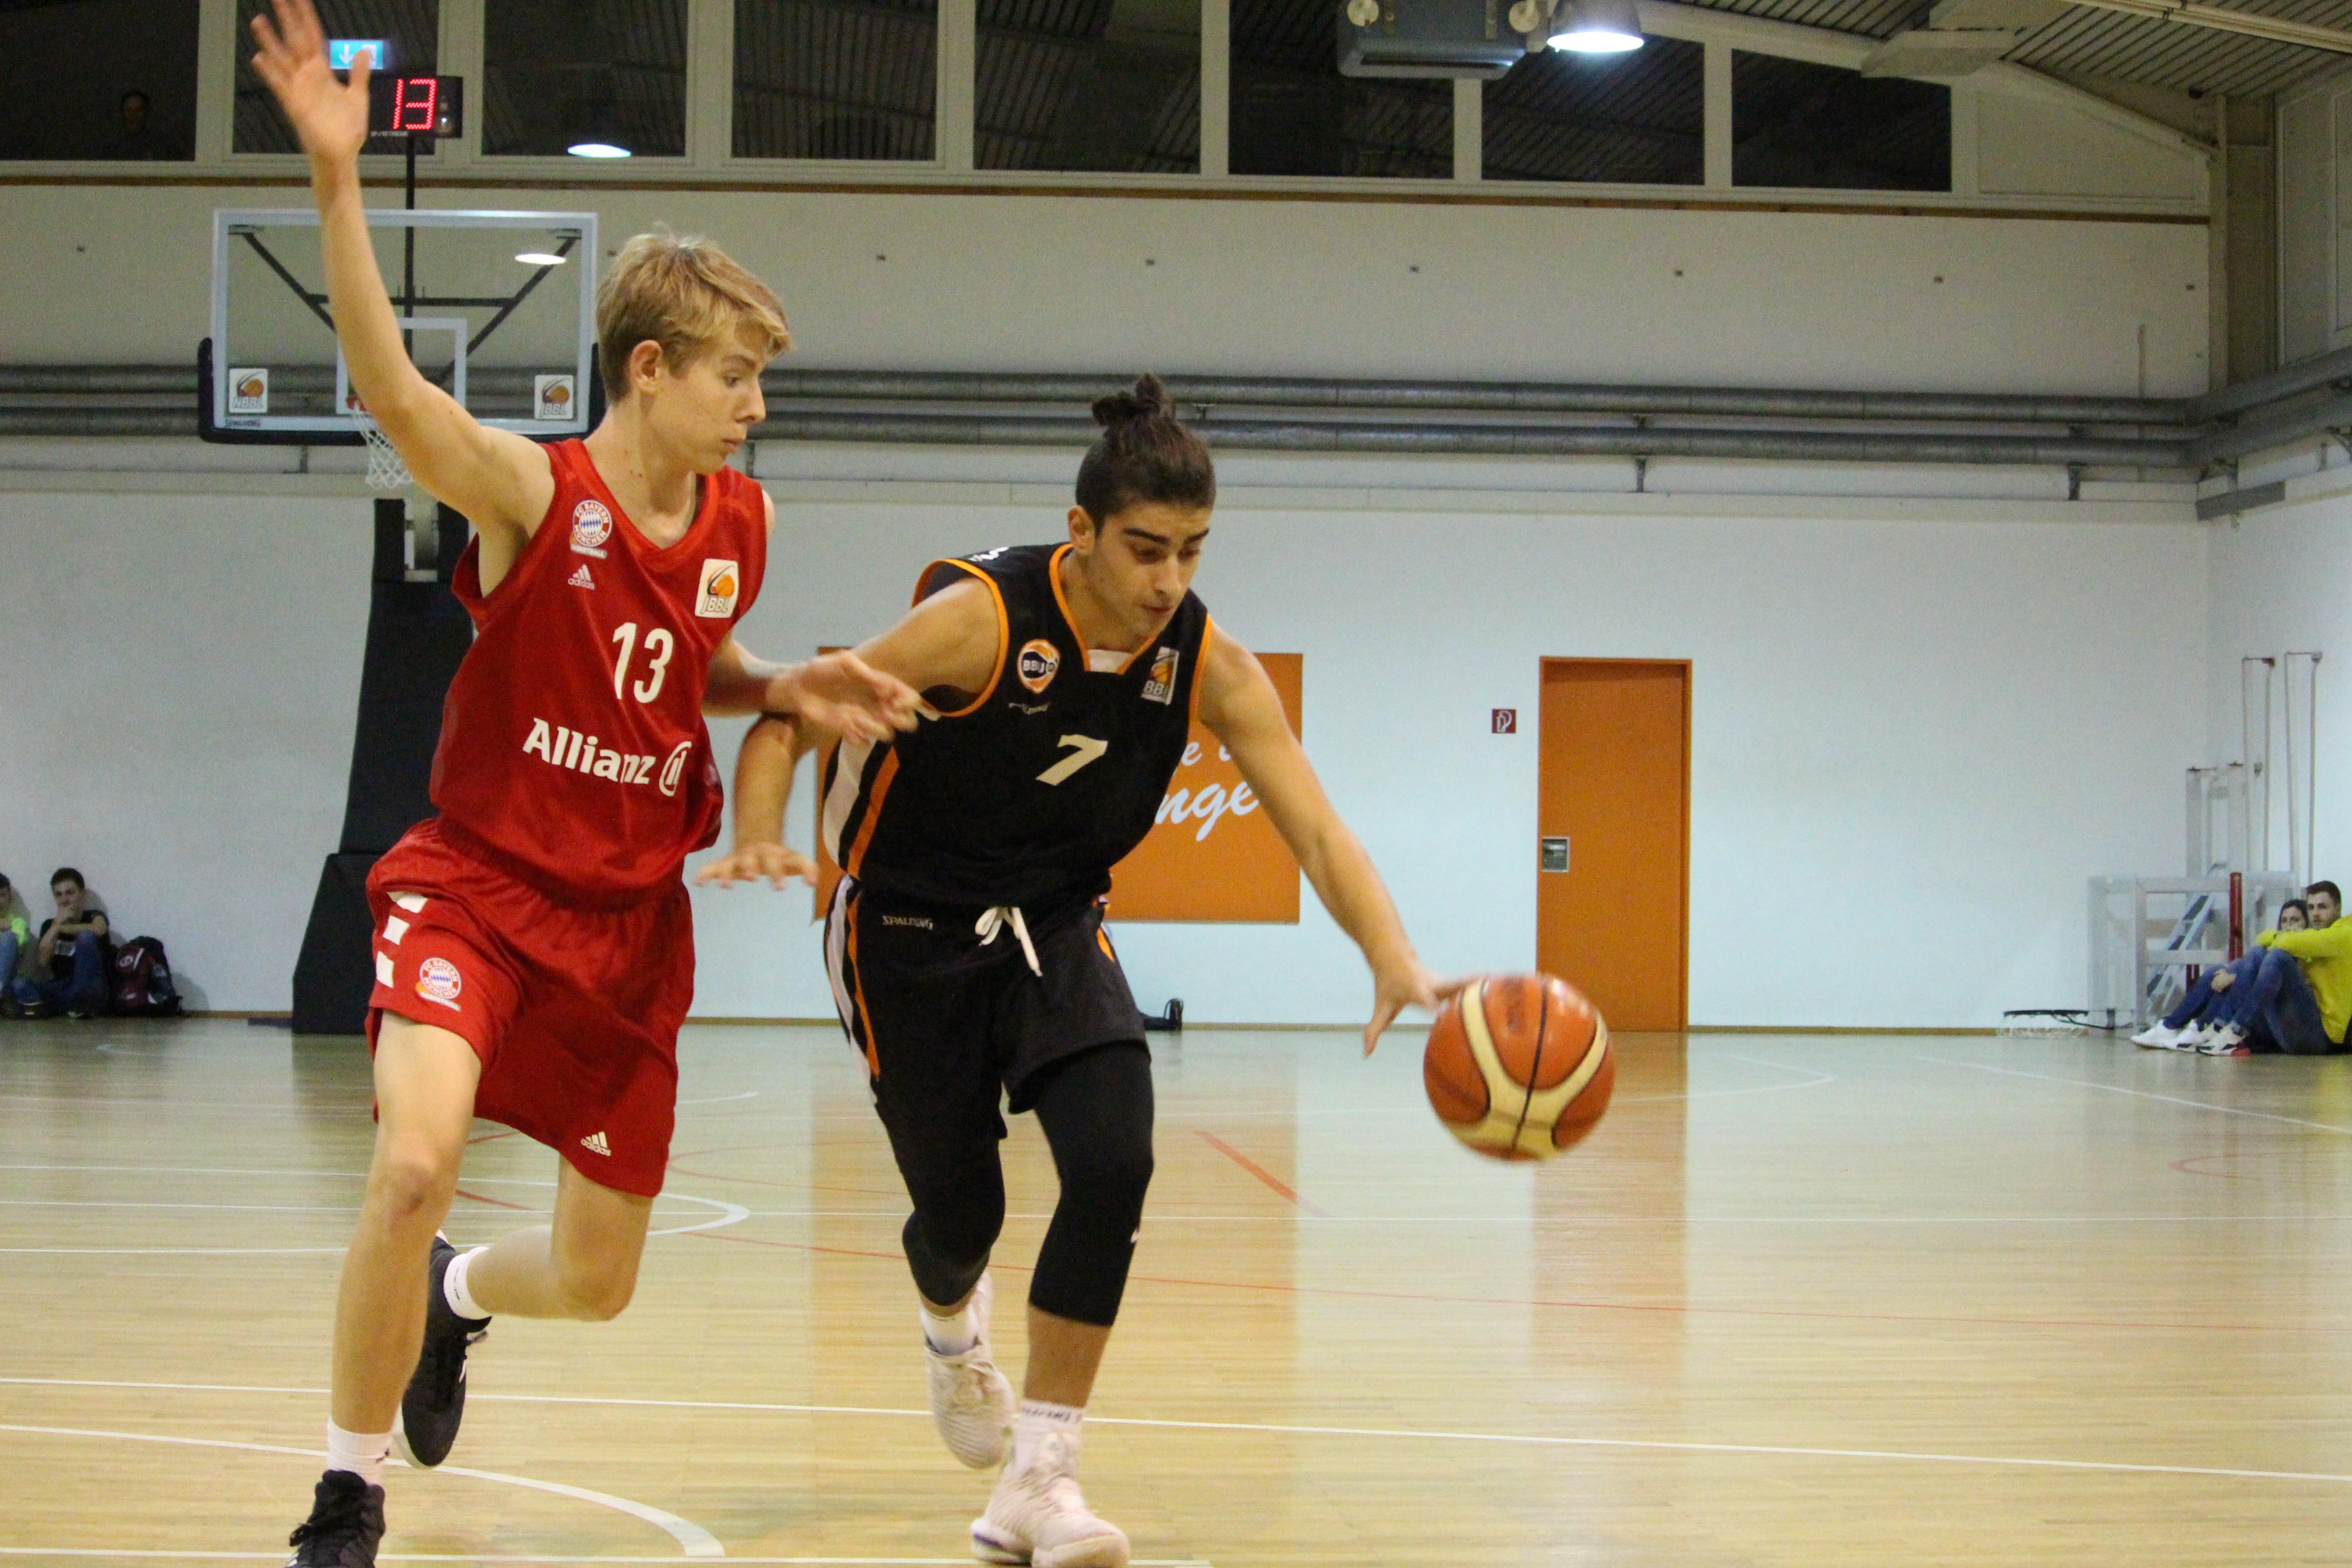 JBBL_19-20_OrangeAcademy_FC-Bayern-München-Basketball_Spieltag7_Alan-Mehinovic